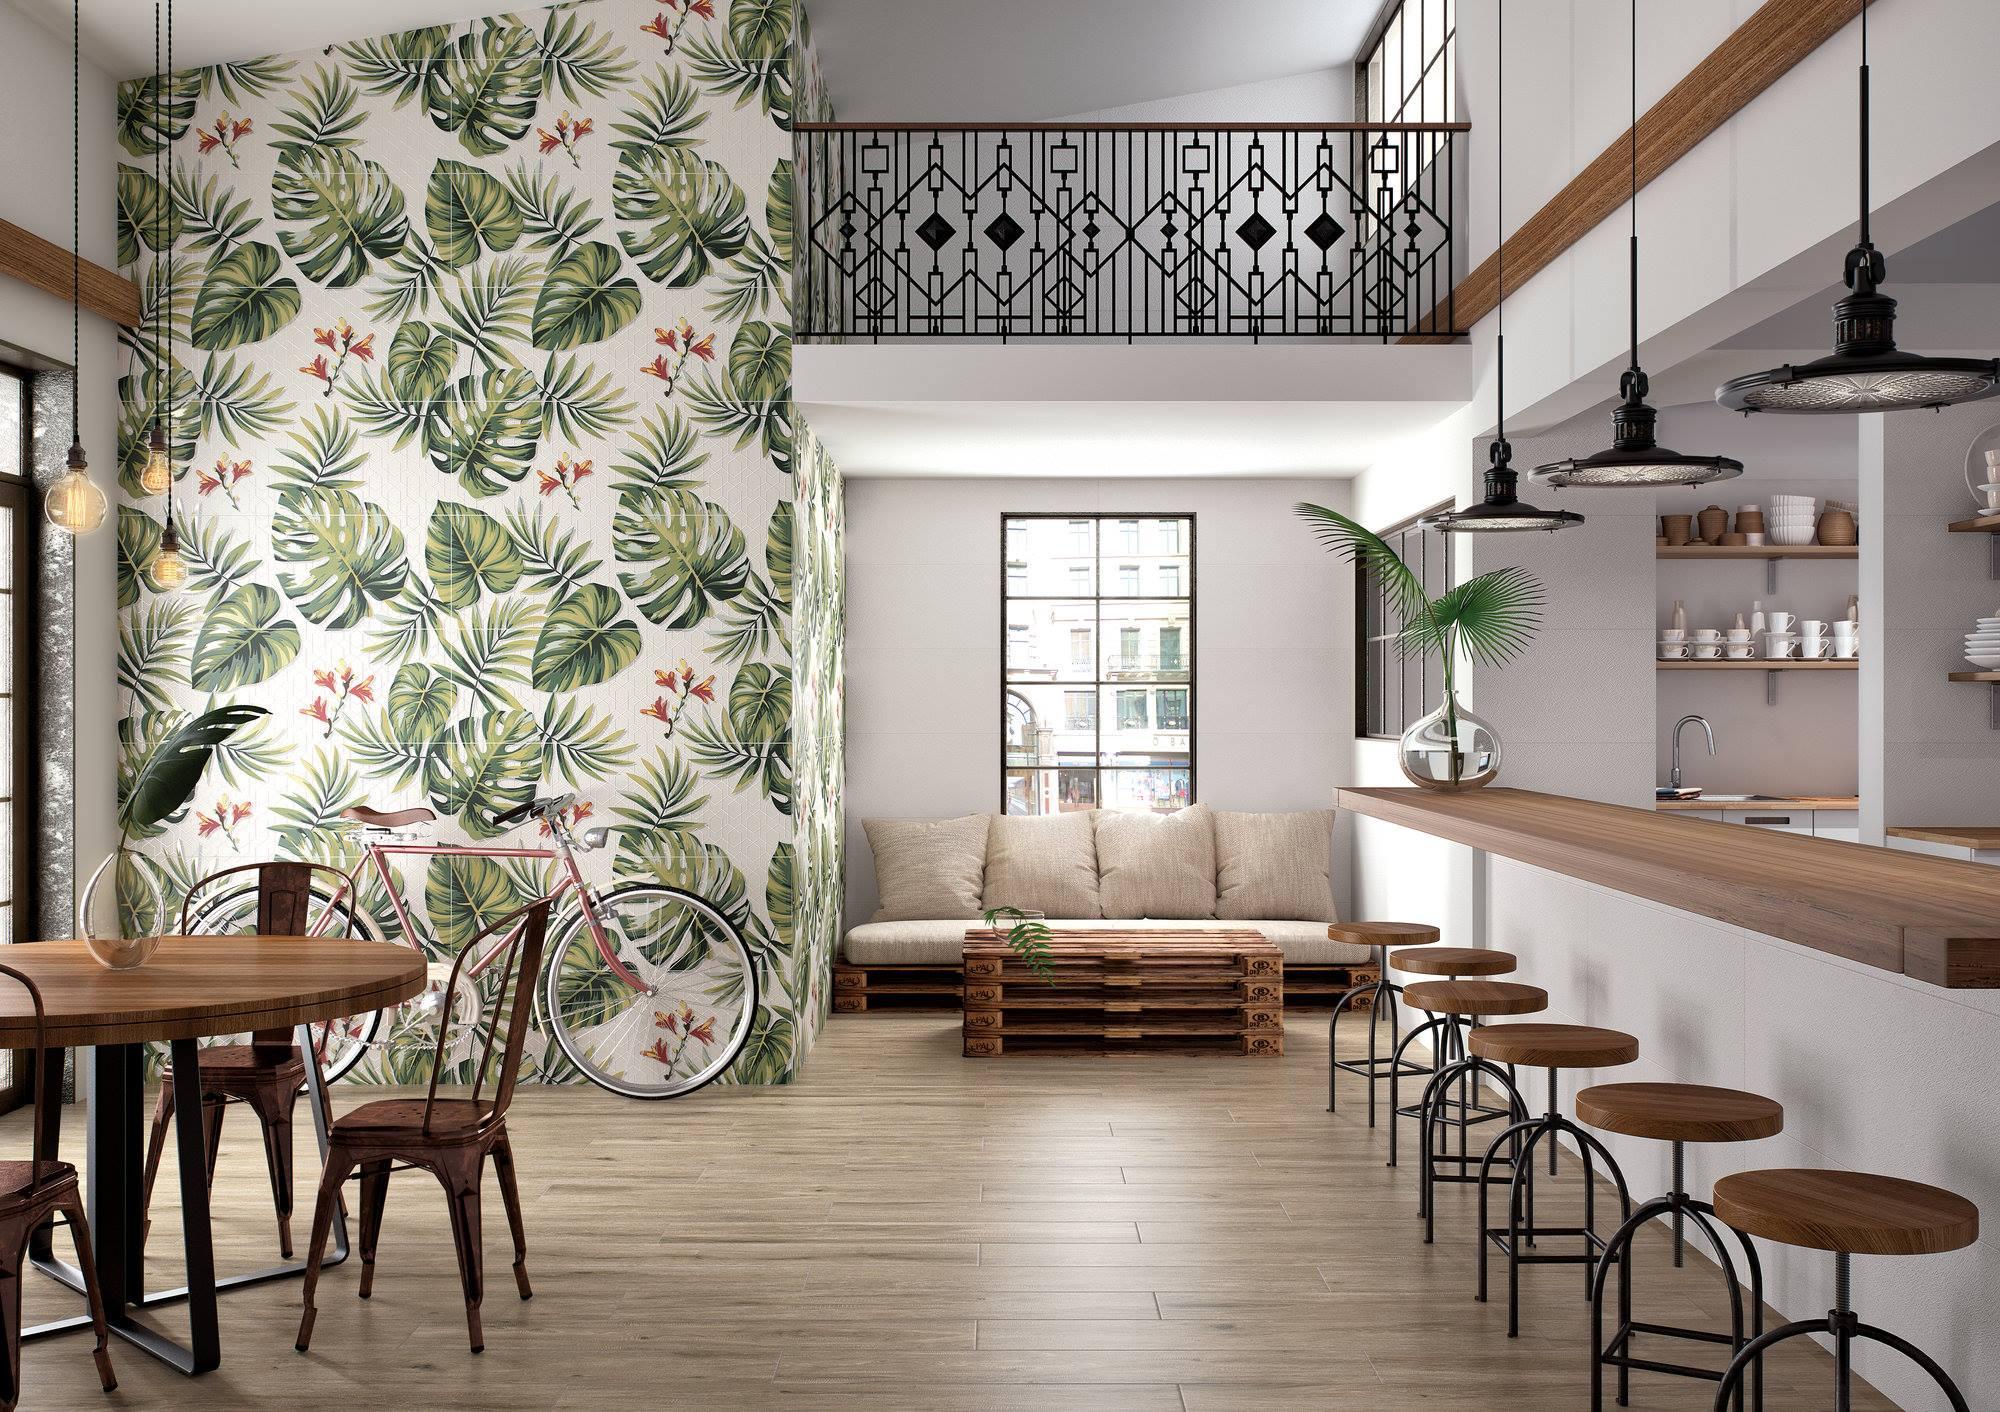 Płytki kuchenne - struktury, 3D i dekory